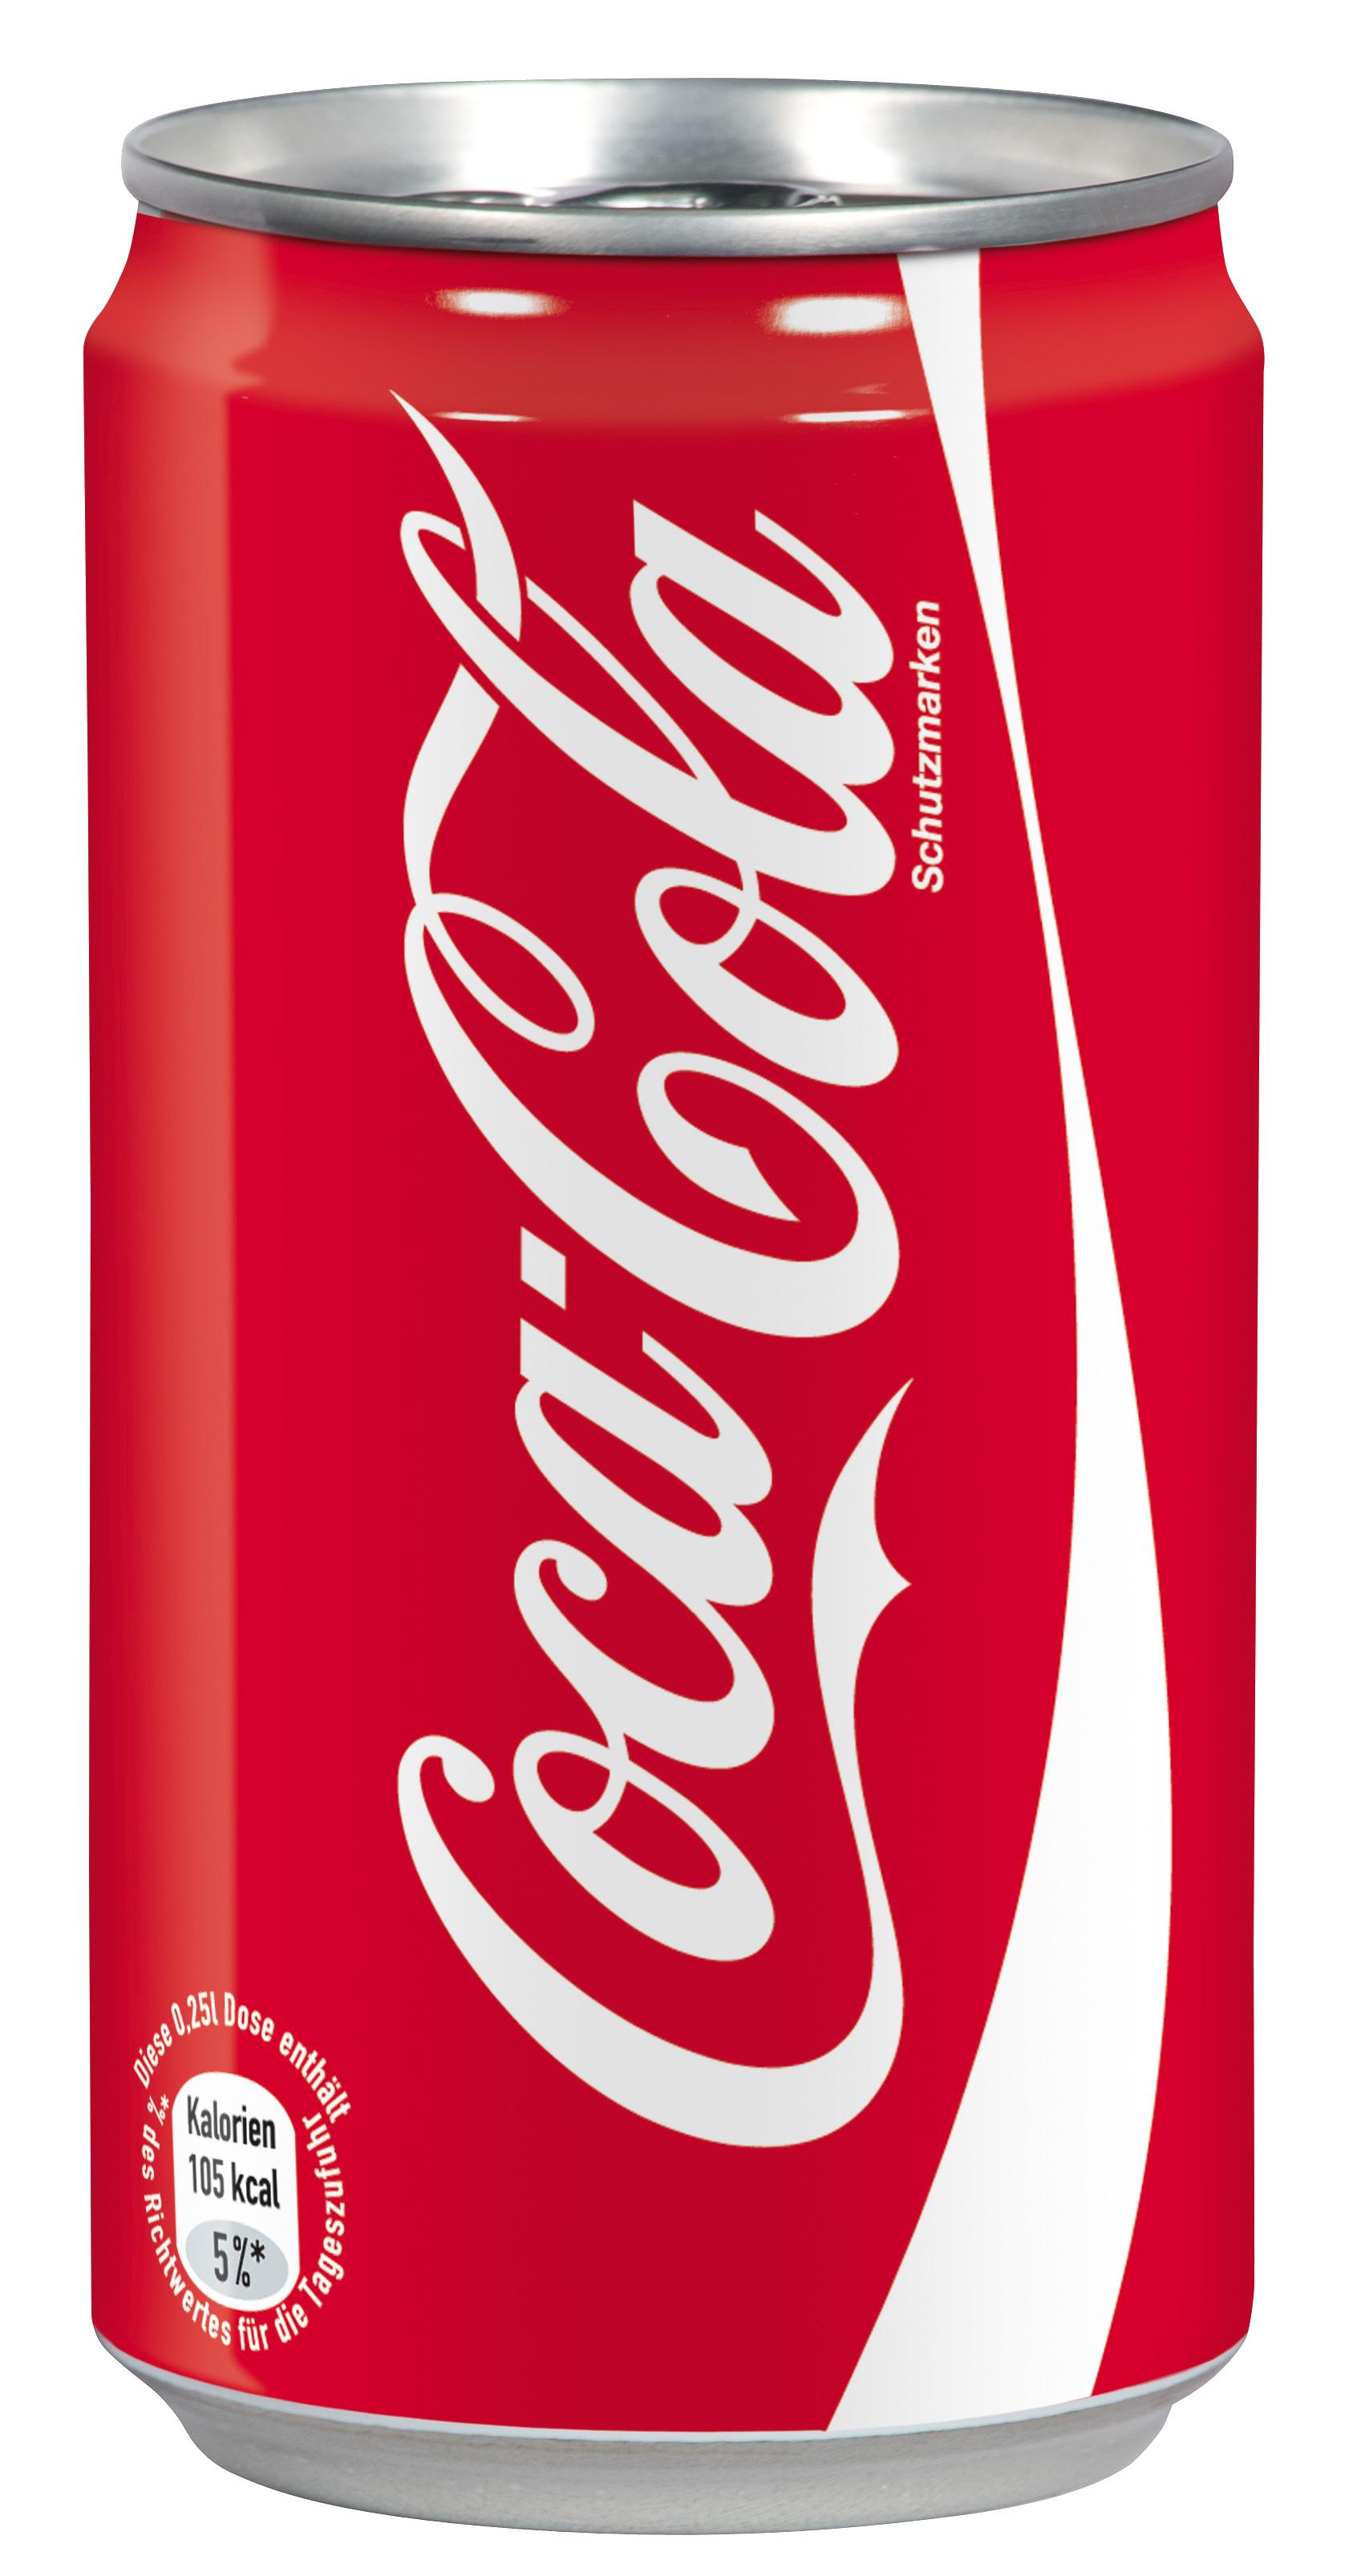 Pin Soda Clipart Transparent #9   Png Soda Can - Soda, Transparent background PNG HD thumbnail